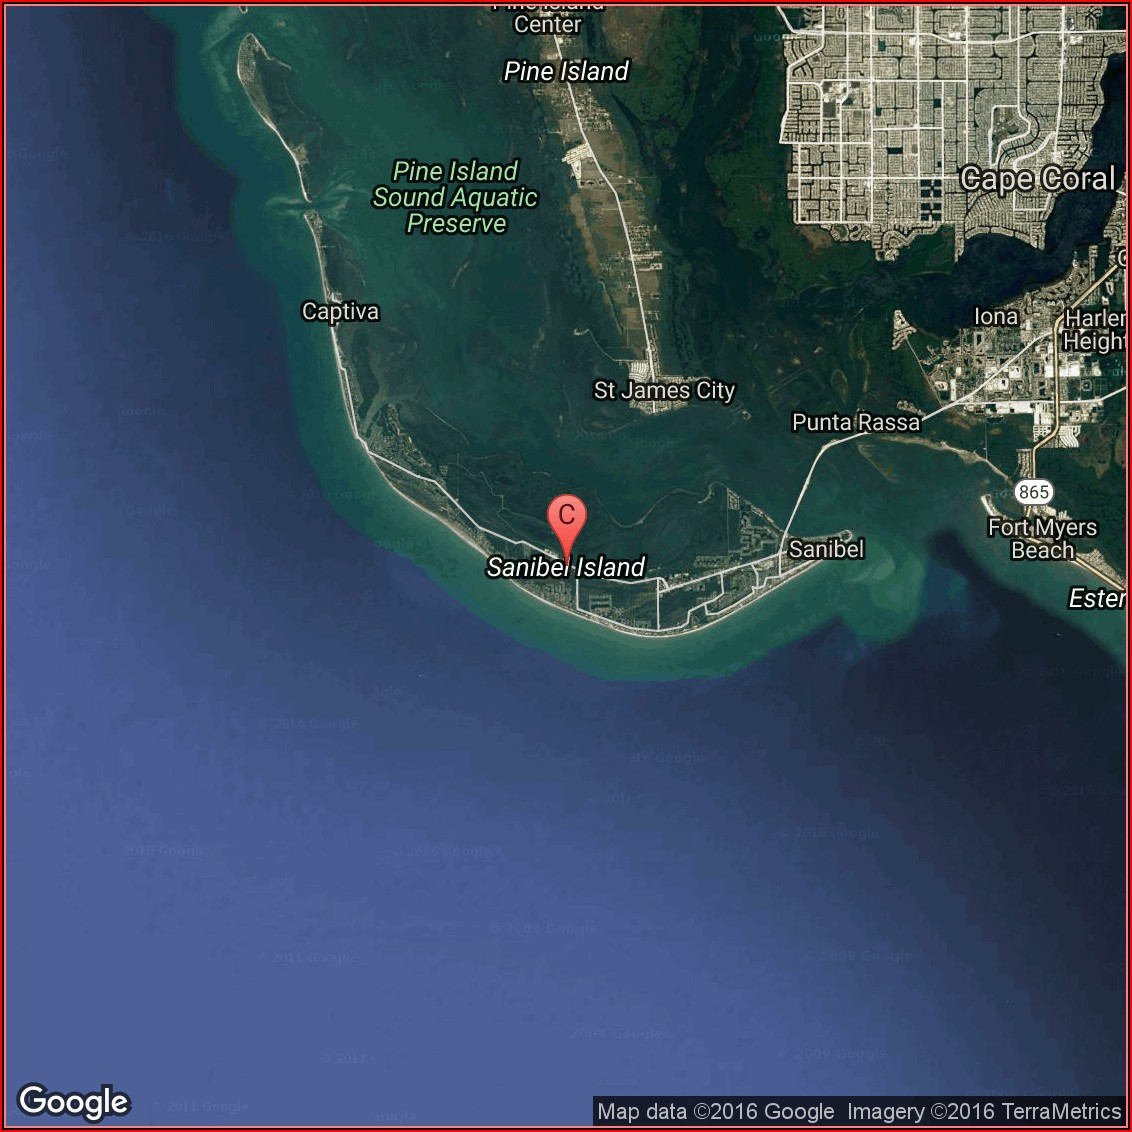 Sanibel Island Google Maps